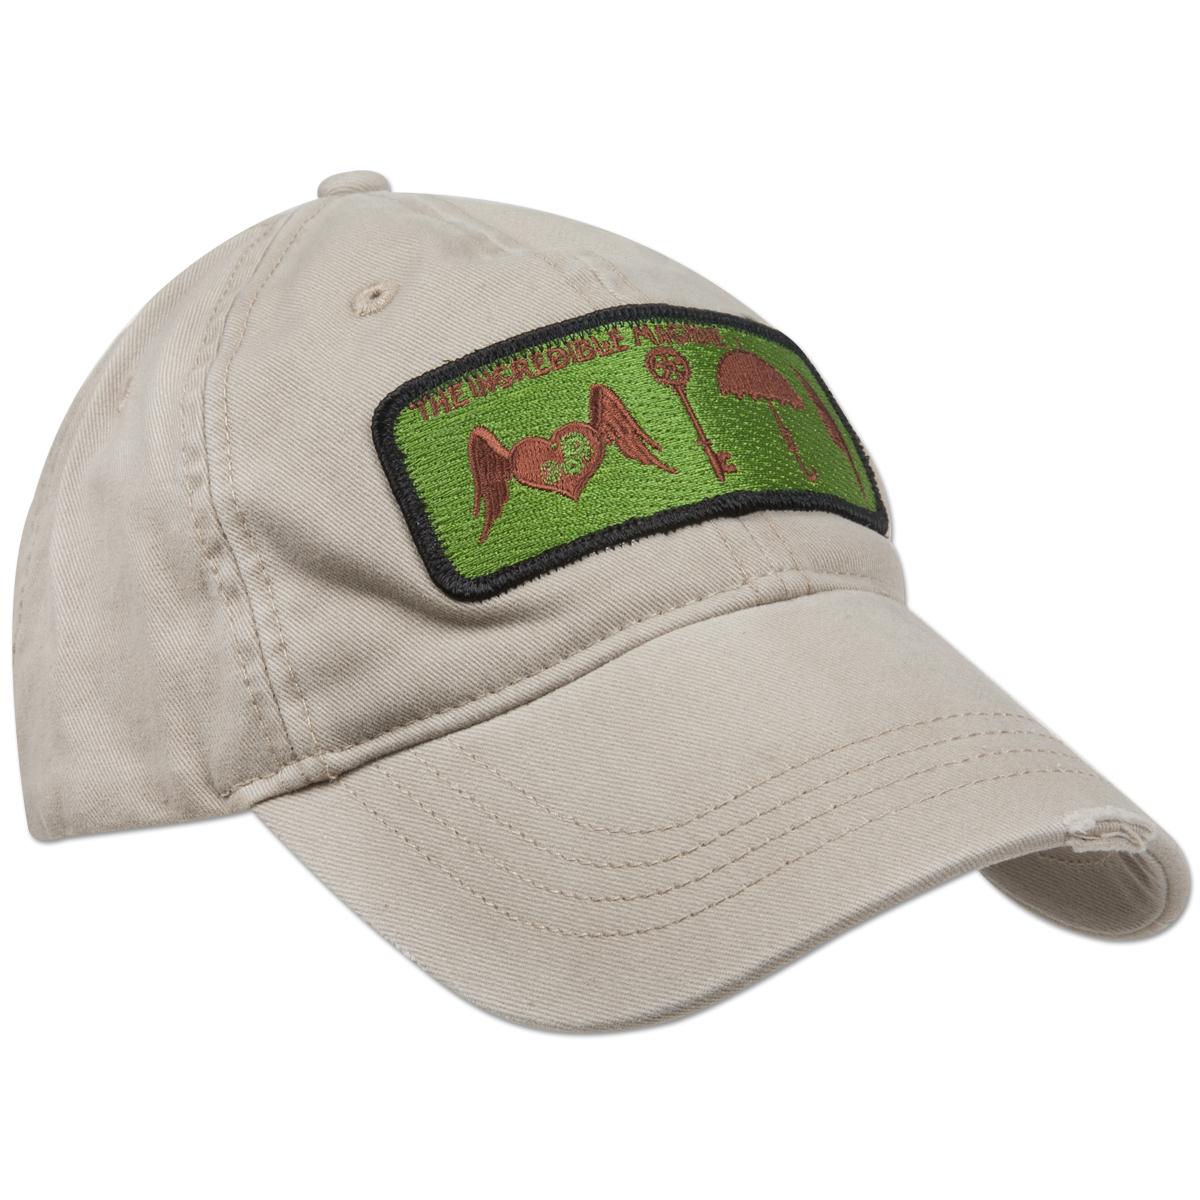 Sugarland Incredible Machine Hat